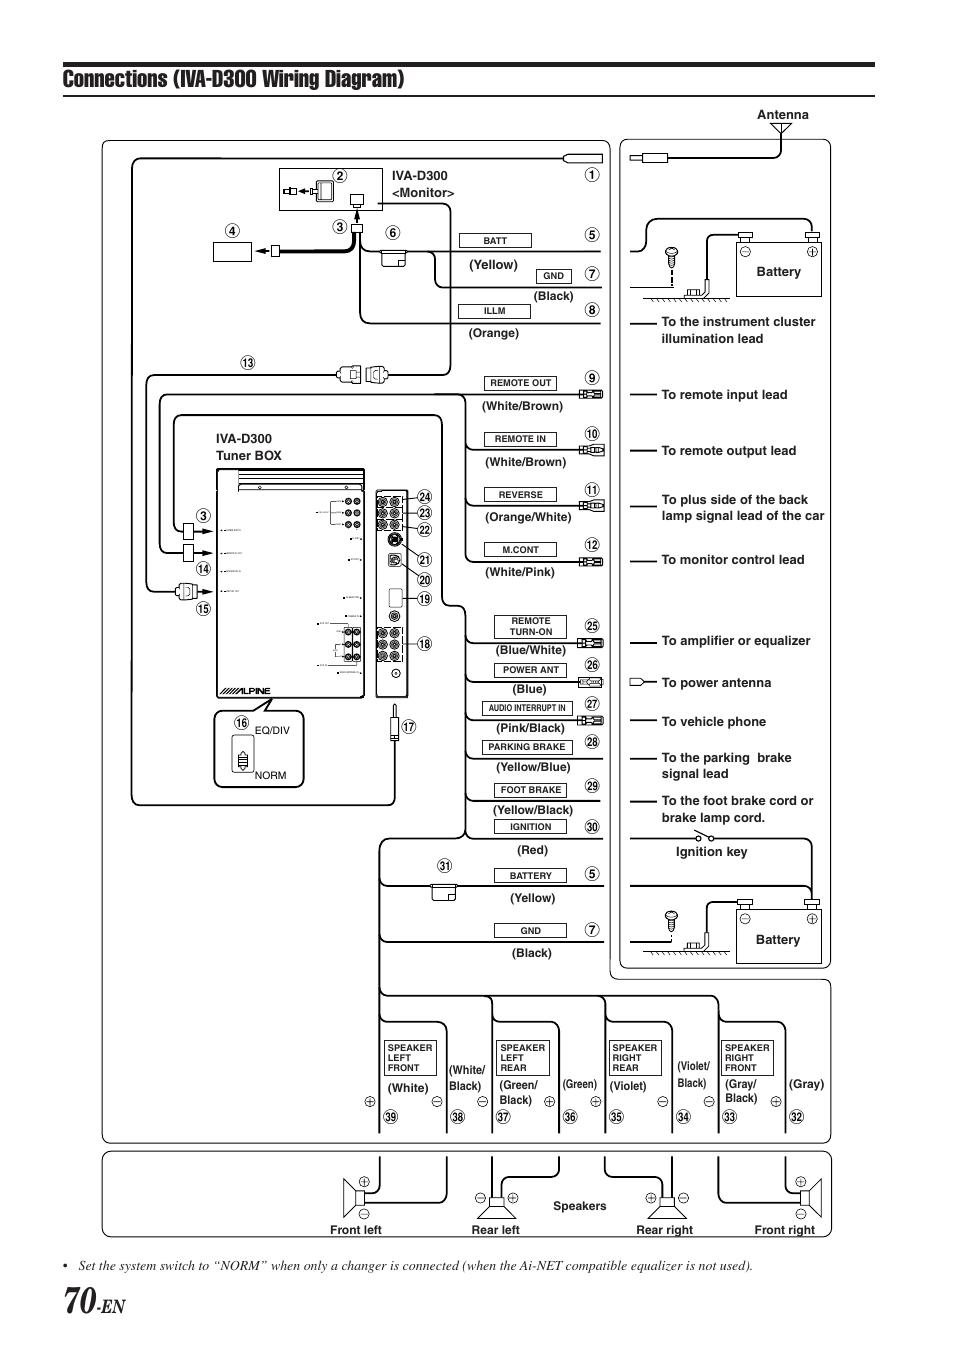 hight resolution of alpine iva w205 wiring diagram wiring diagram data today alpine dvd wiring diagram